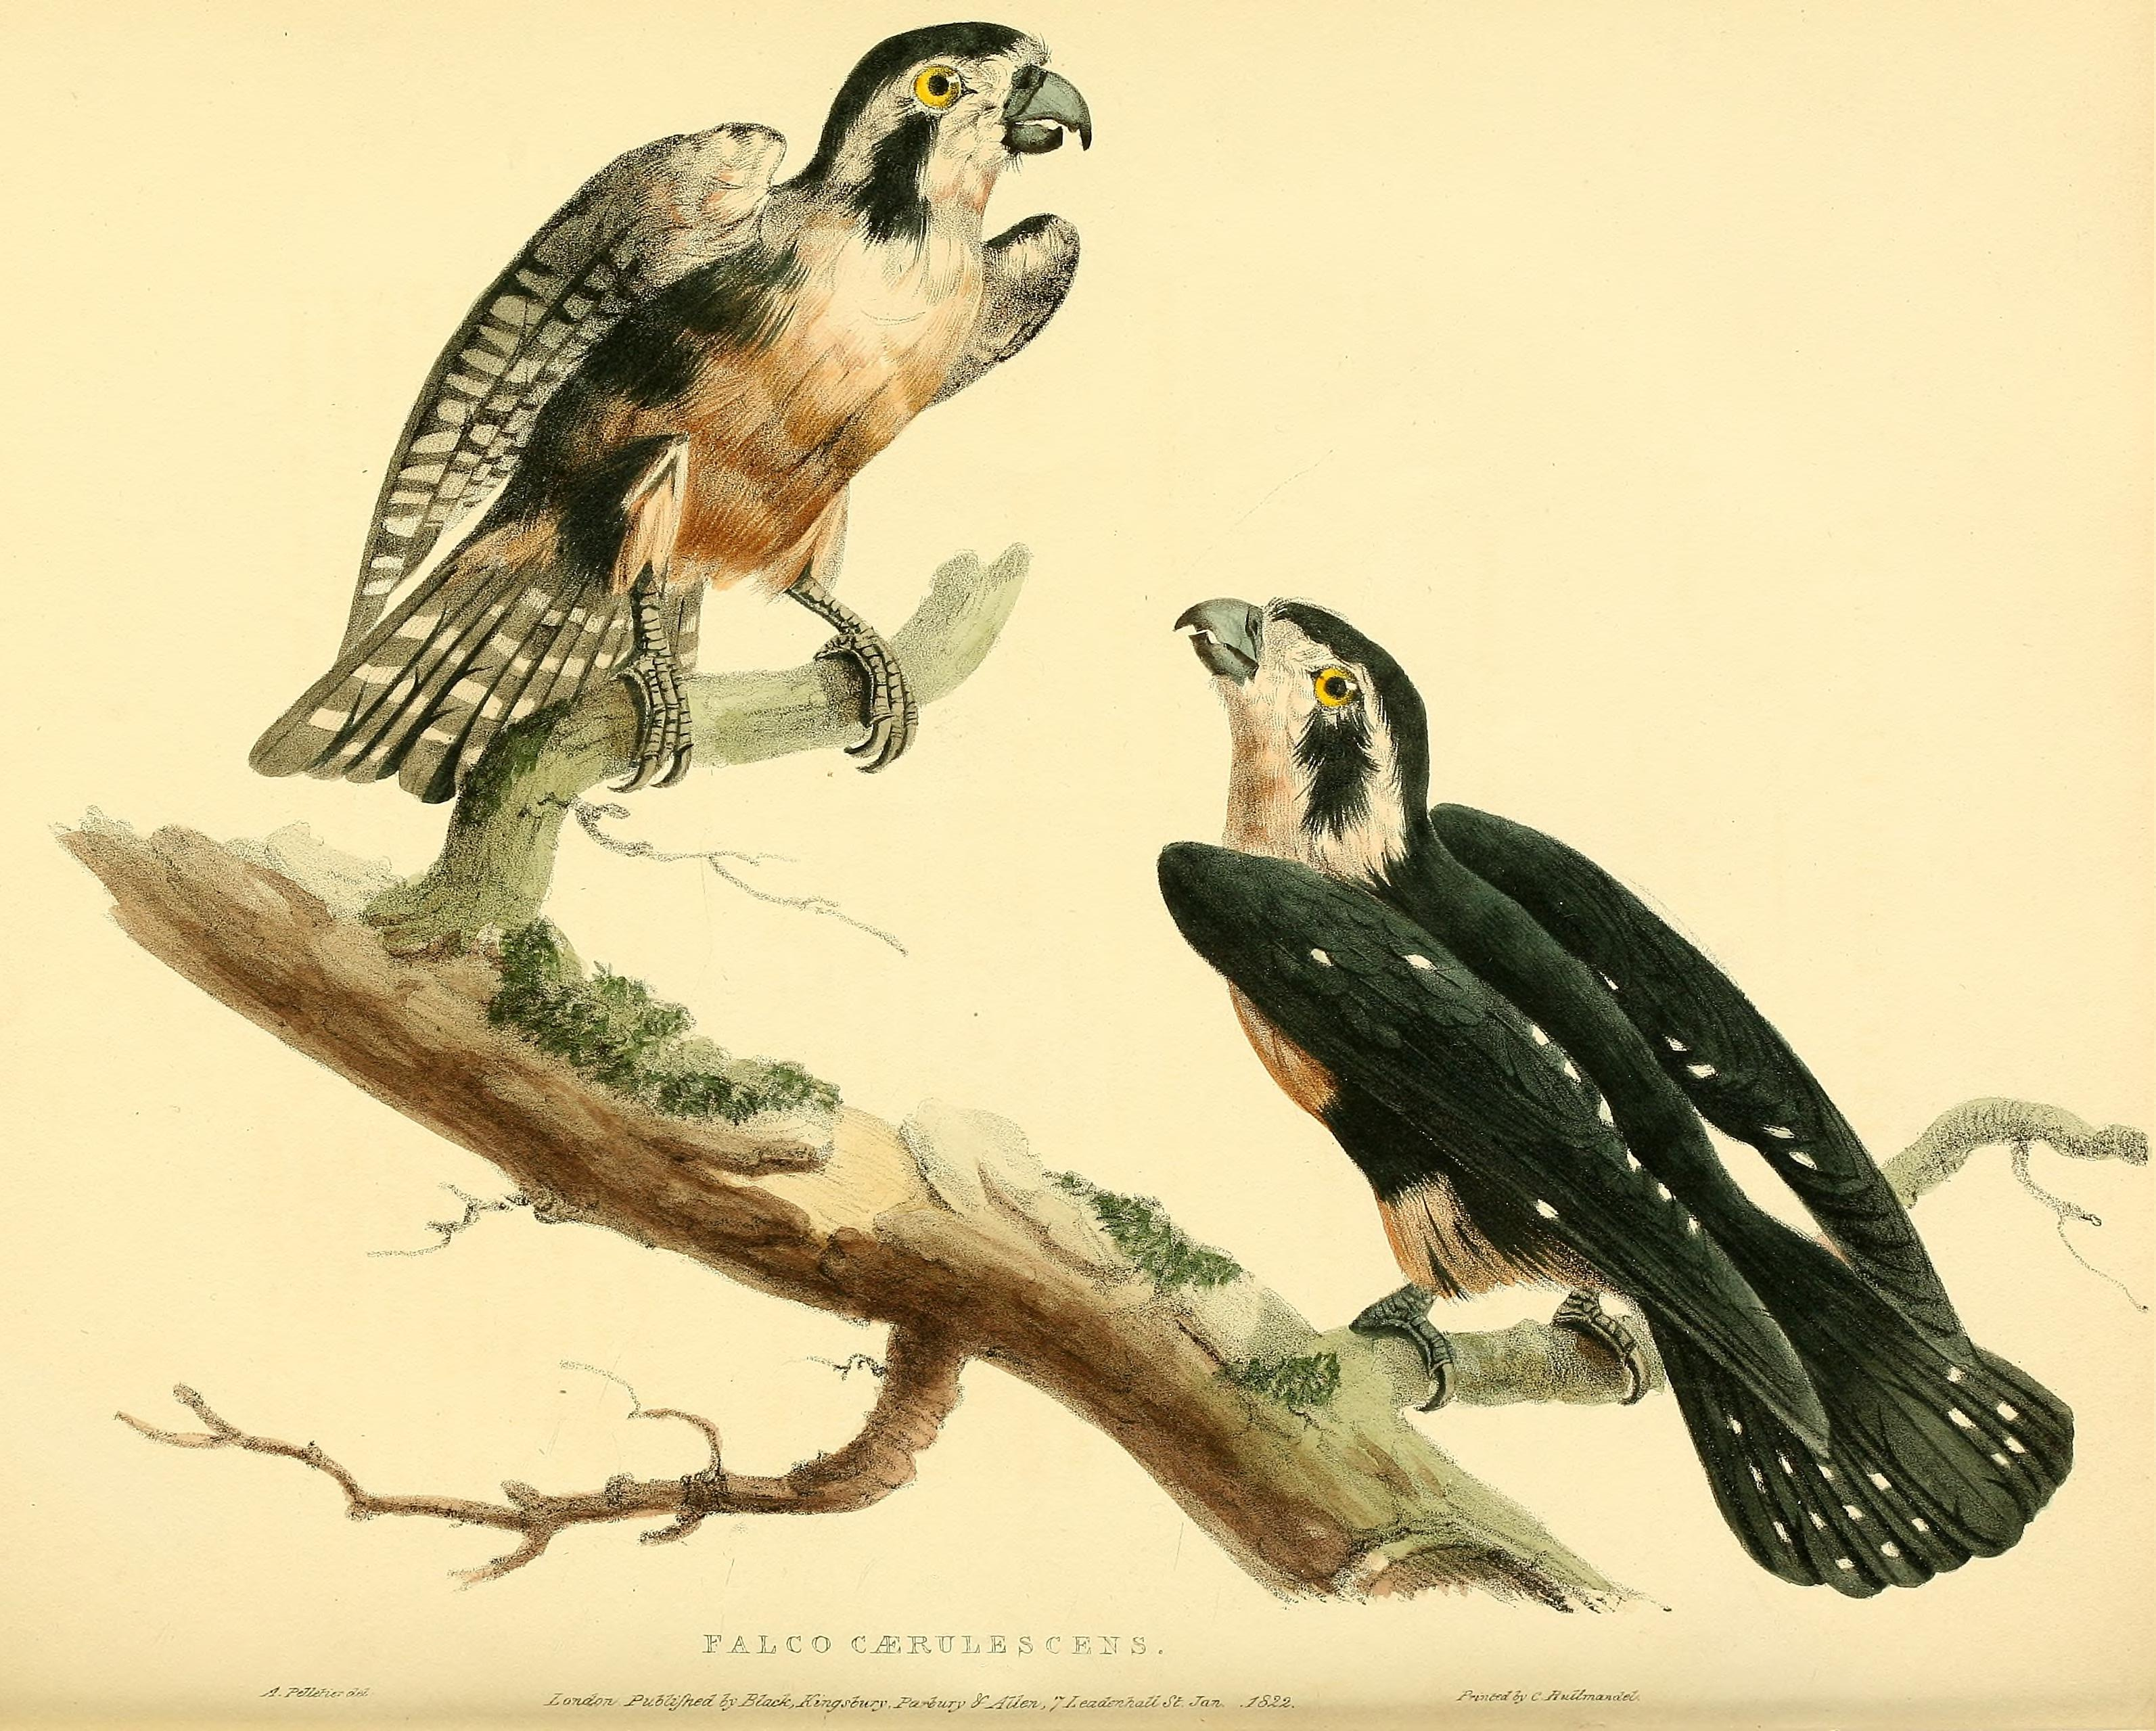 Datei:Falco fringillarius Pelettier Hullmandel 1822.jpg